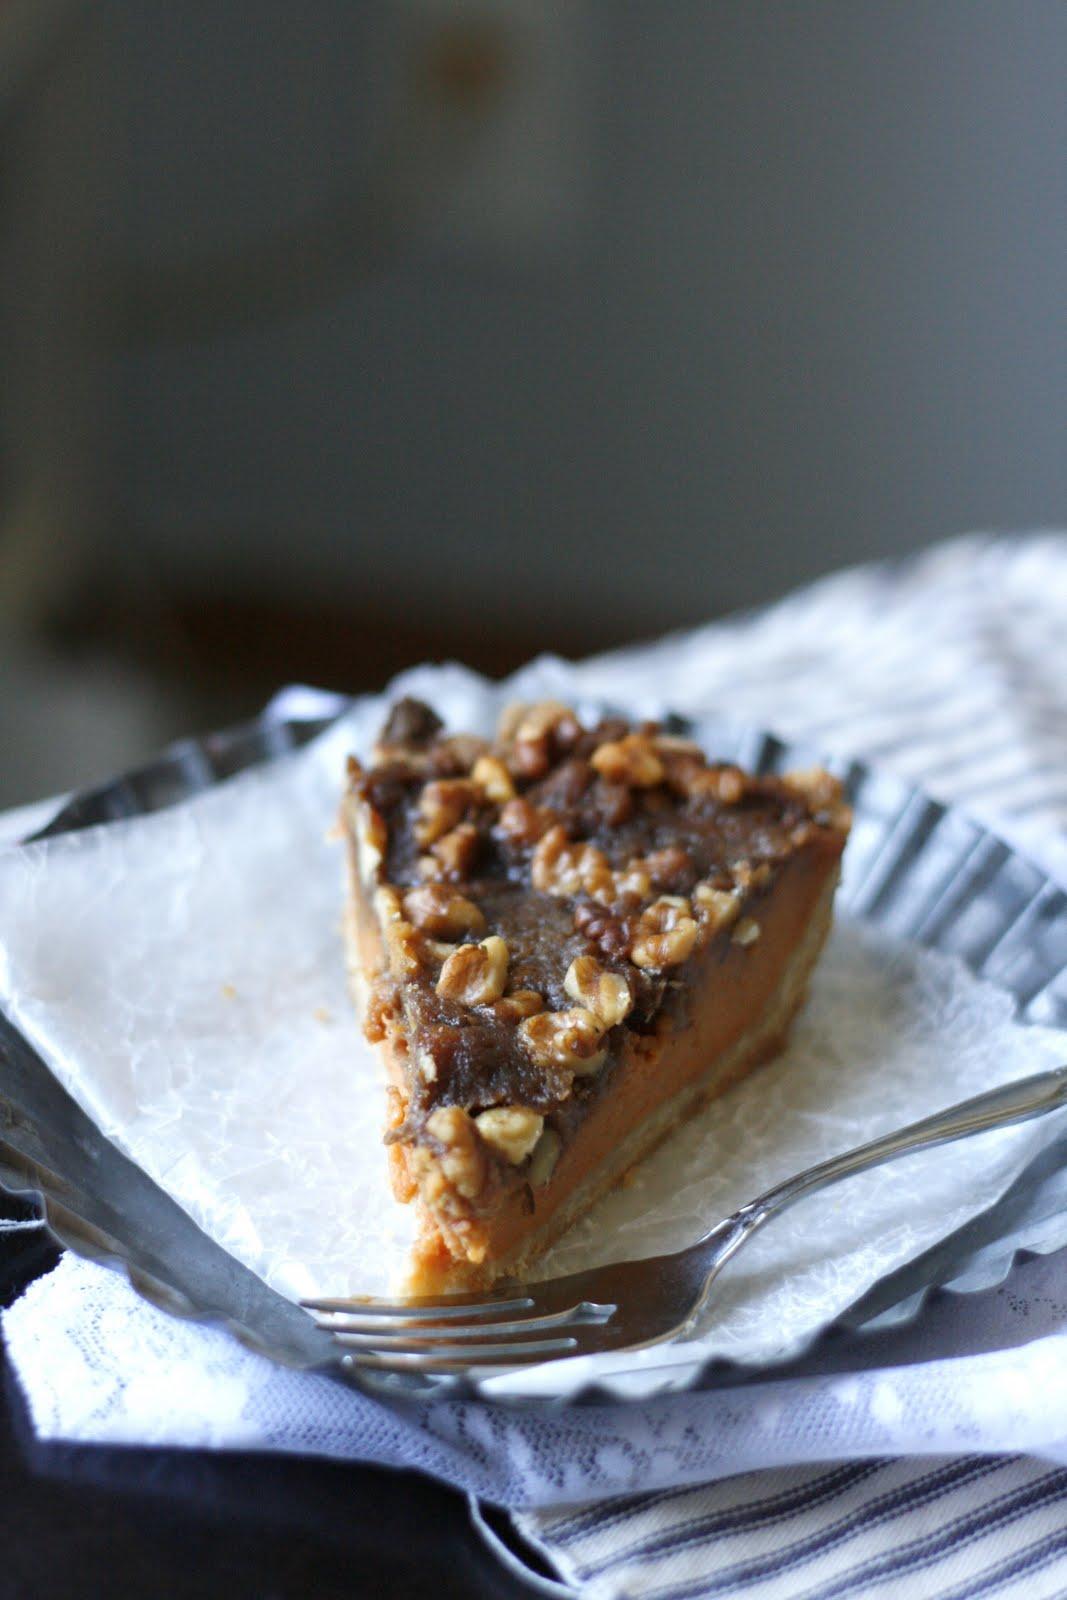 ... Scones: Sweet Potato Pie with Walnut Streusel and No-Roll Pie Crust